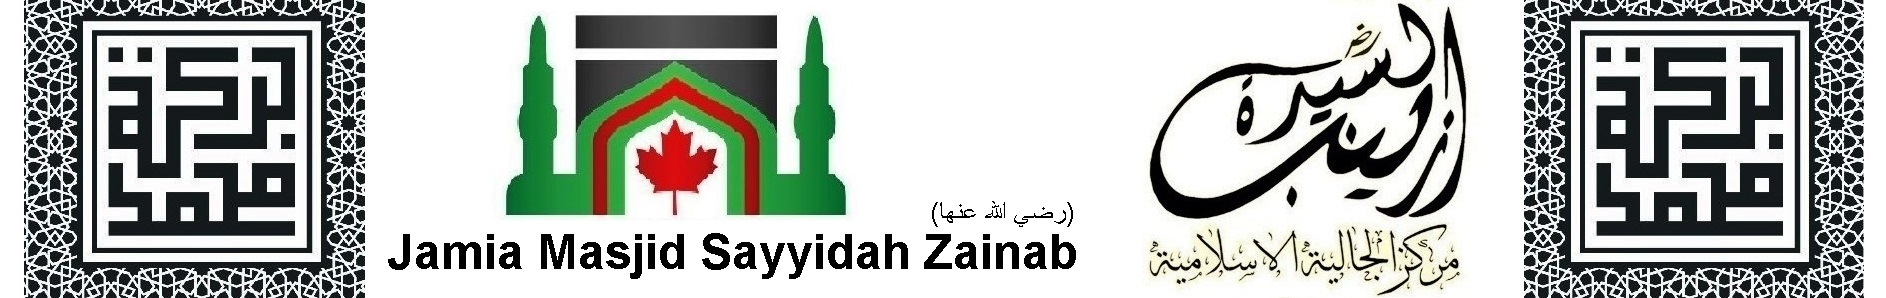 Sayyidah Zainab Muslim Community Centre Ajax